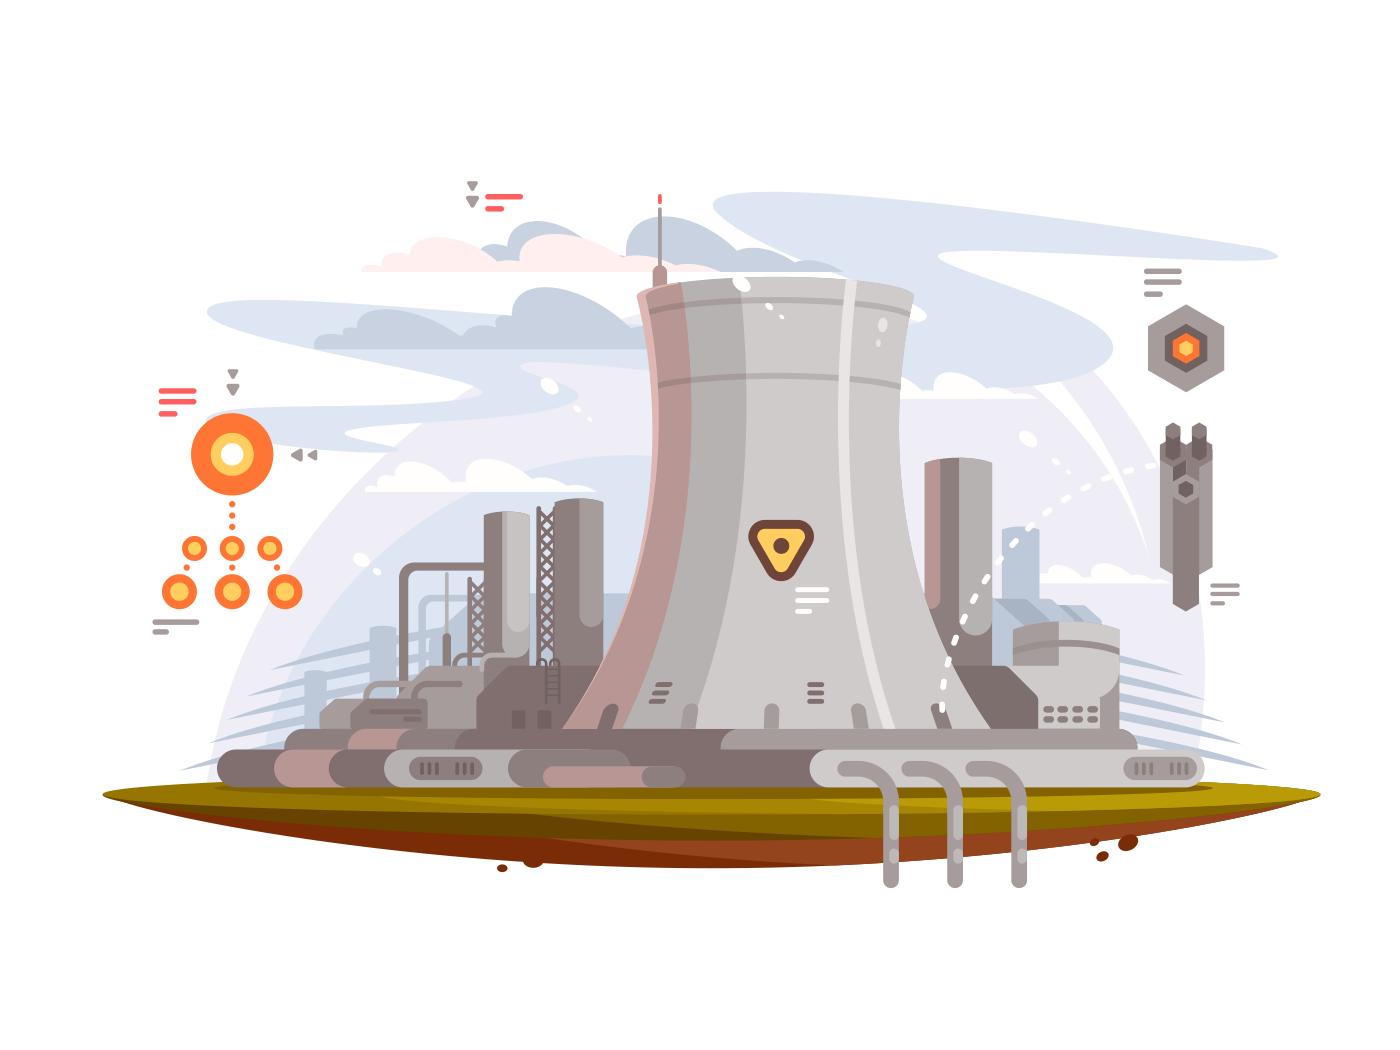 Powerful nuclear reactor illustration